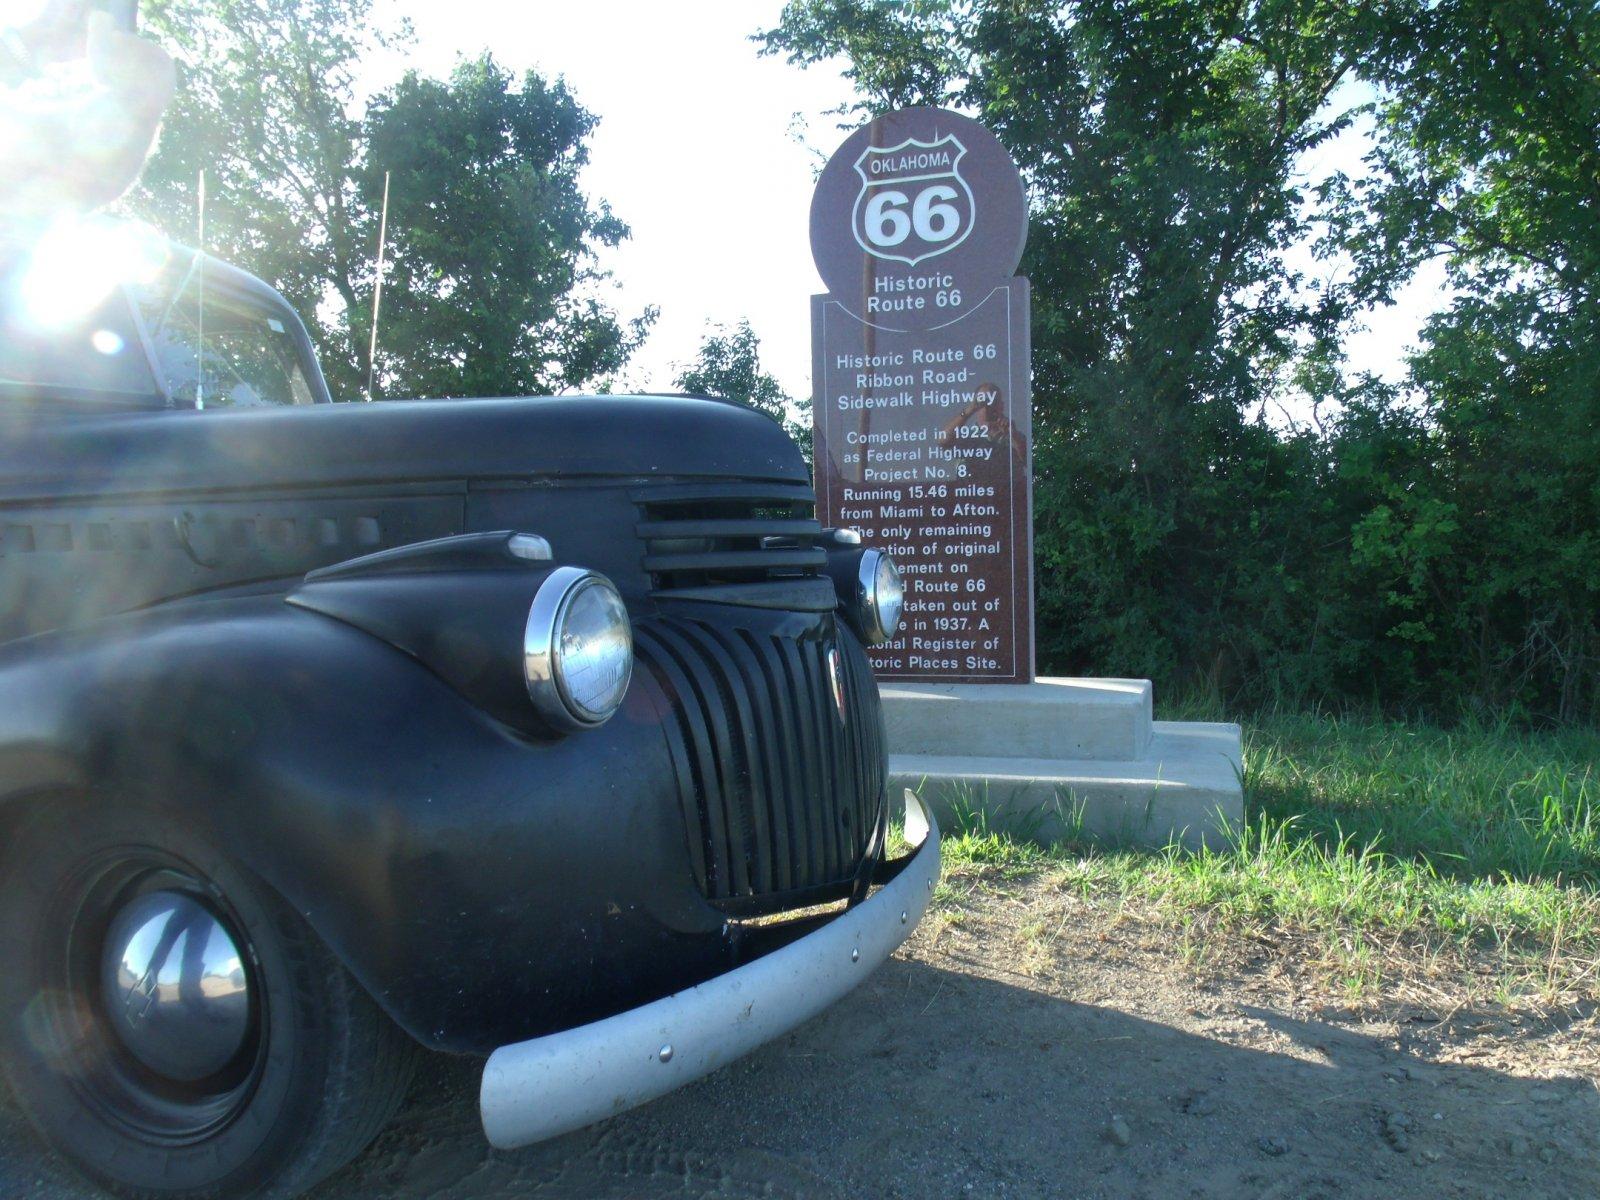 rt 66 day 2 031 sidewalk highway monument.jpg